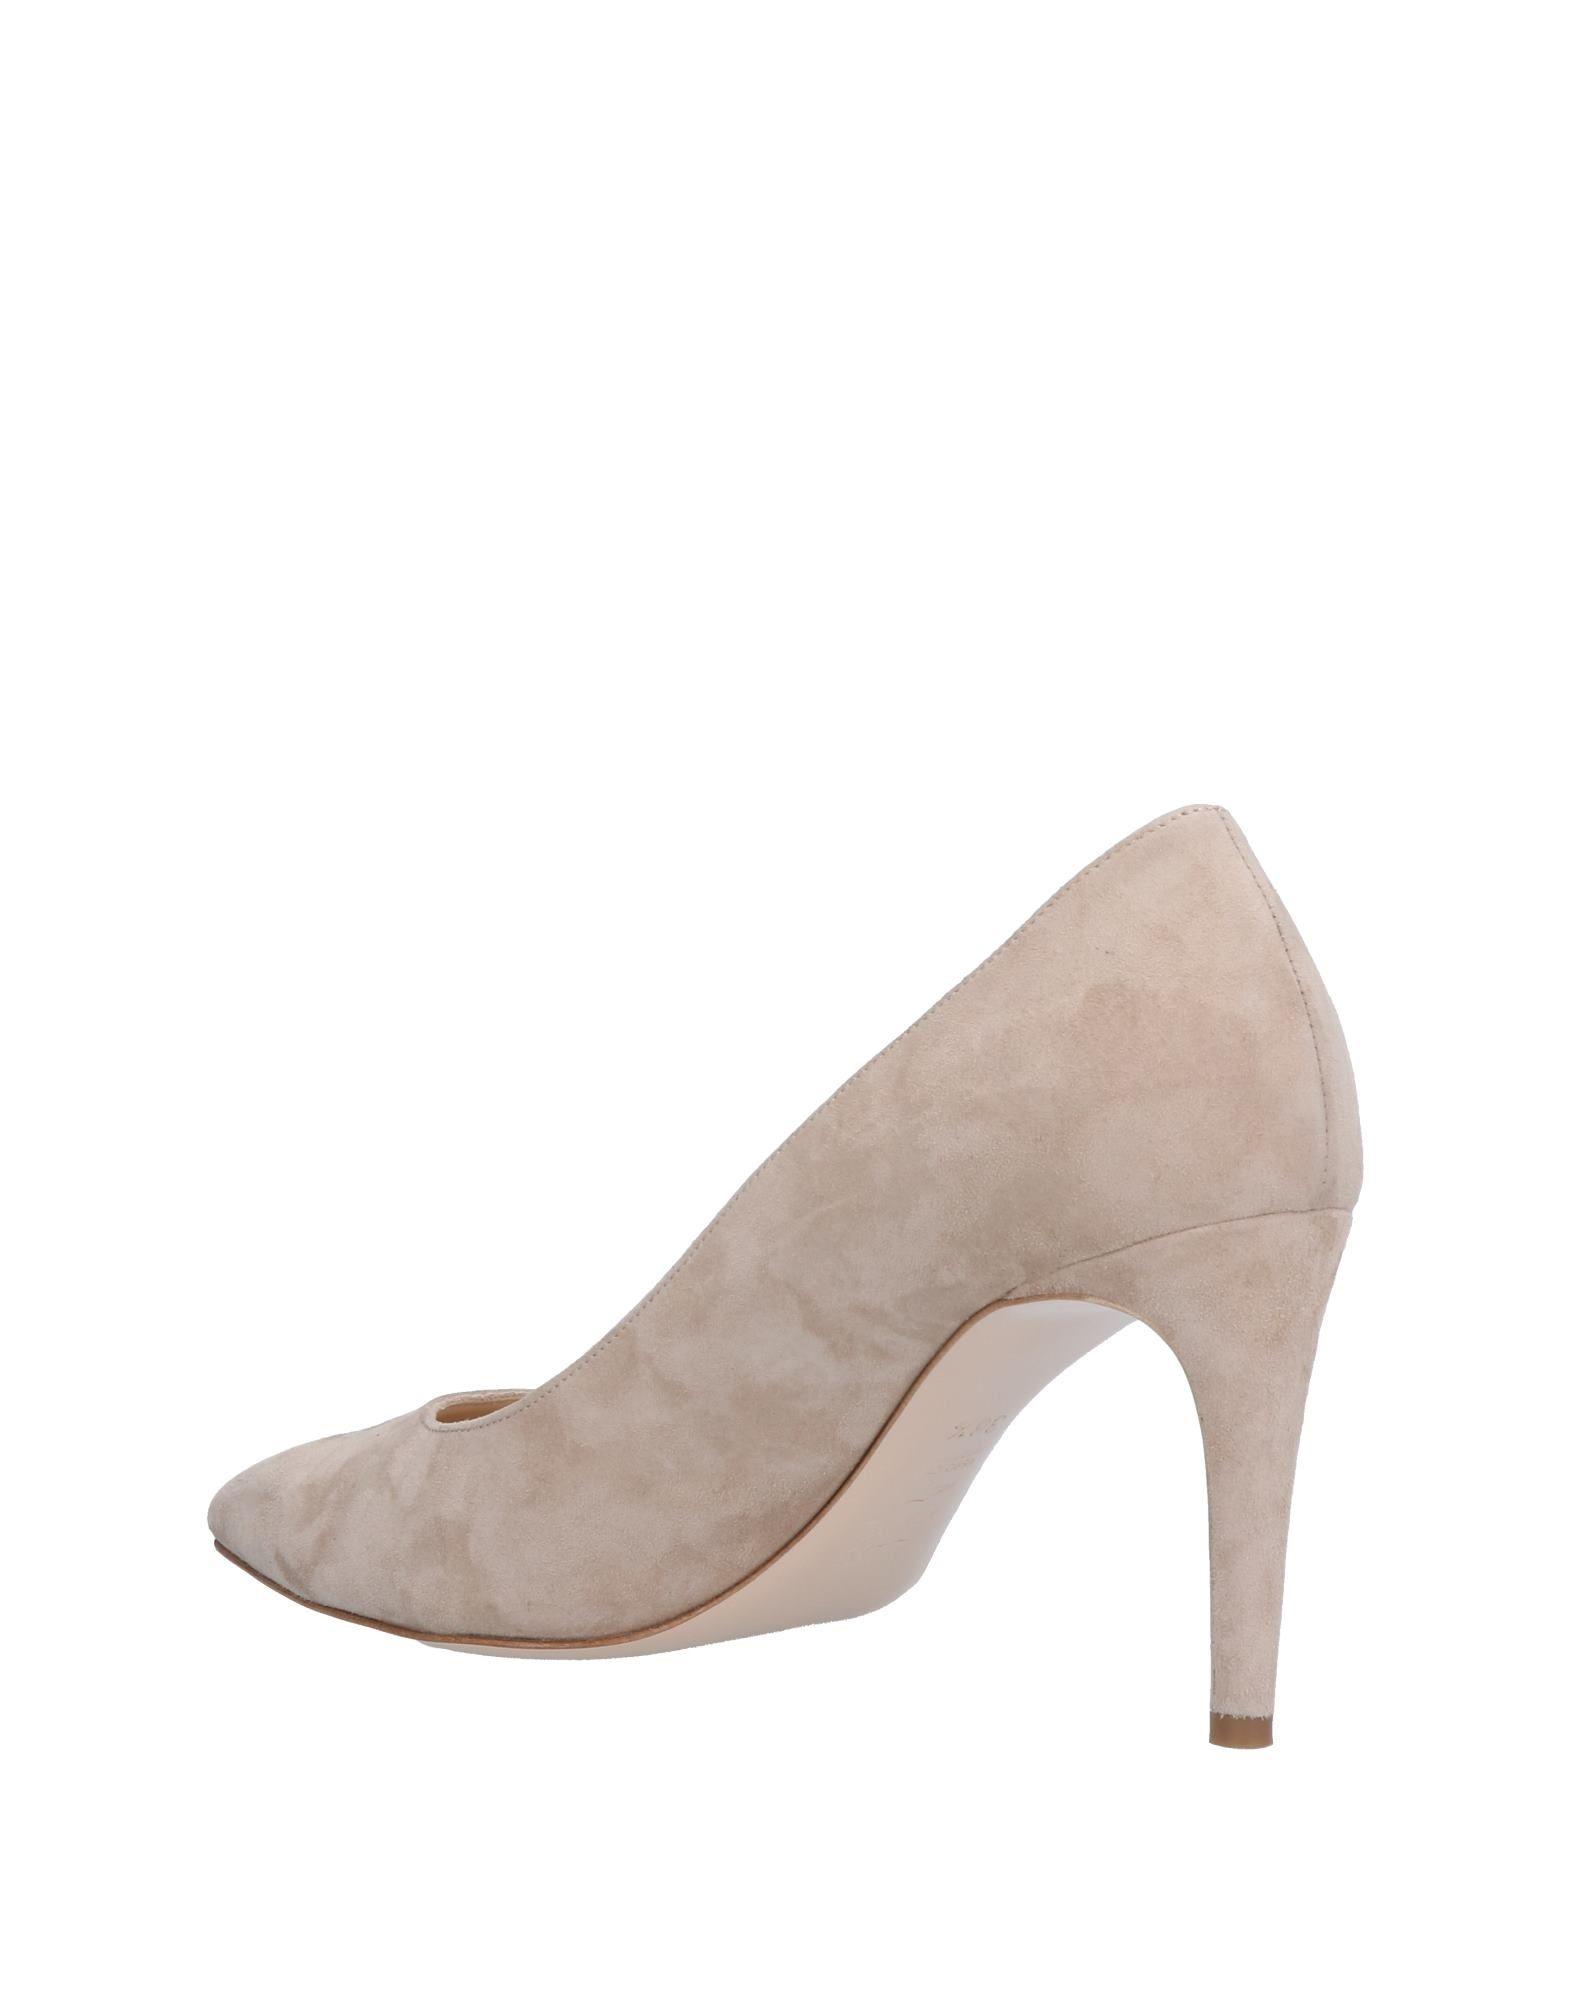 Gut um Pumps billige Schuhe zu tragenBorgonuovo Pumps um Damen  11494731CB 5f20a7